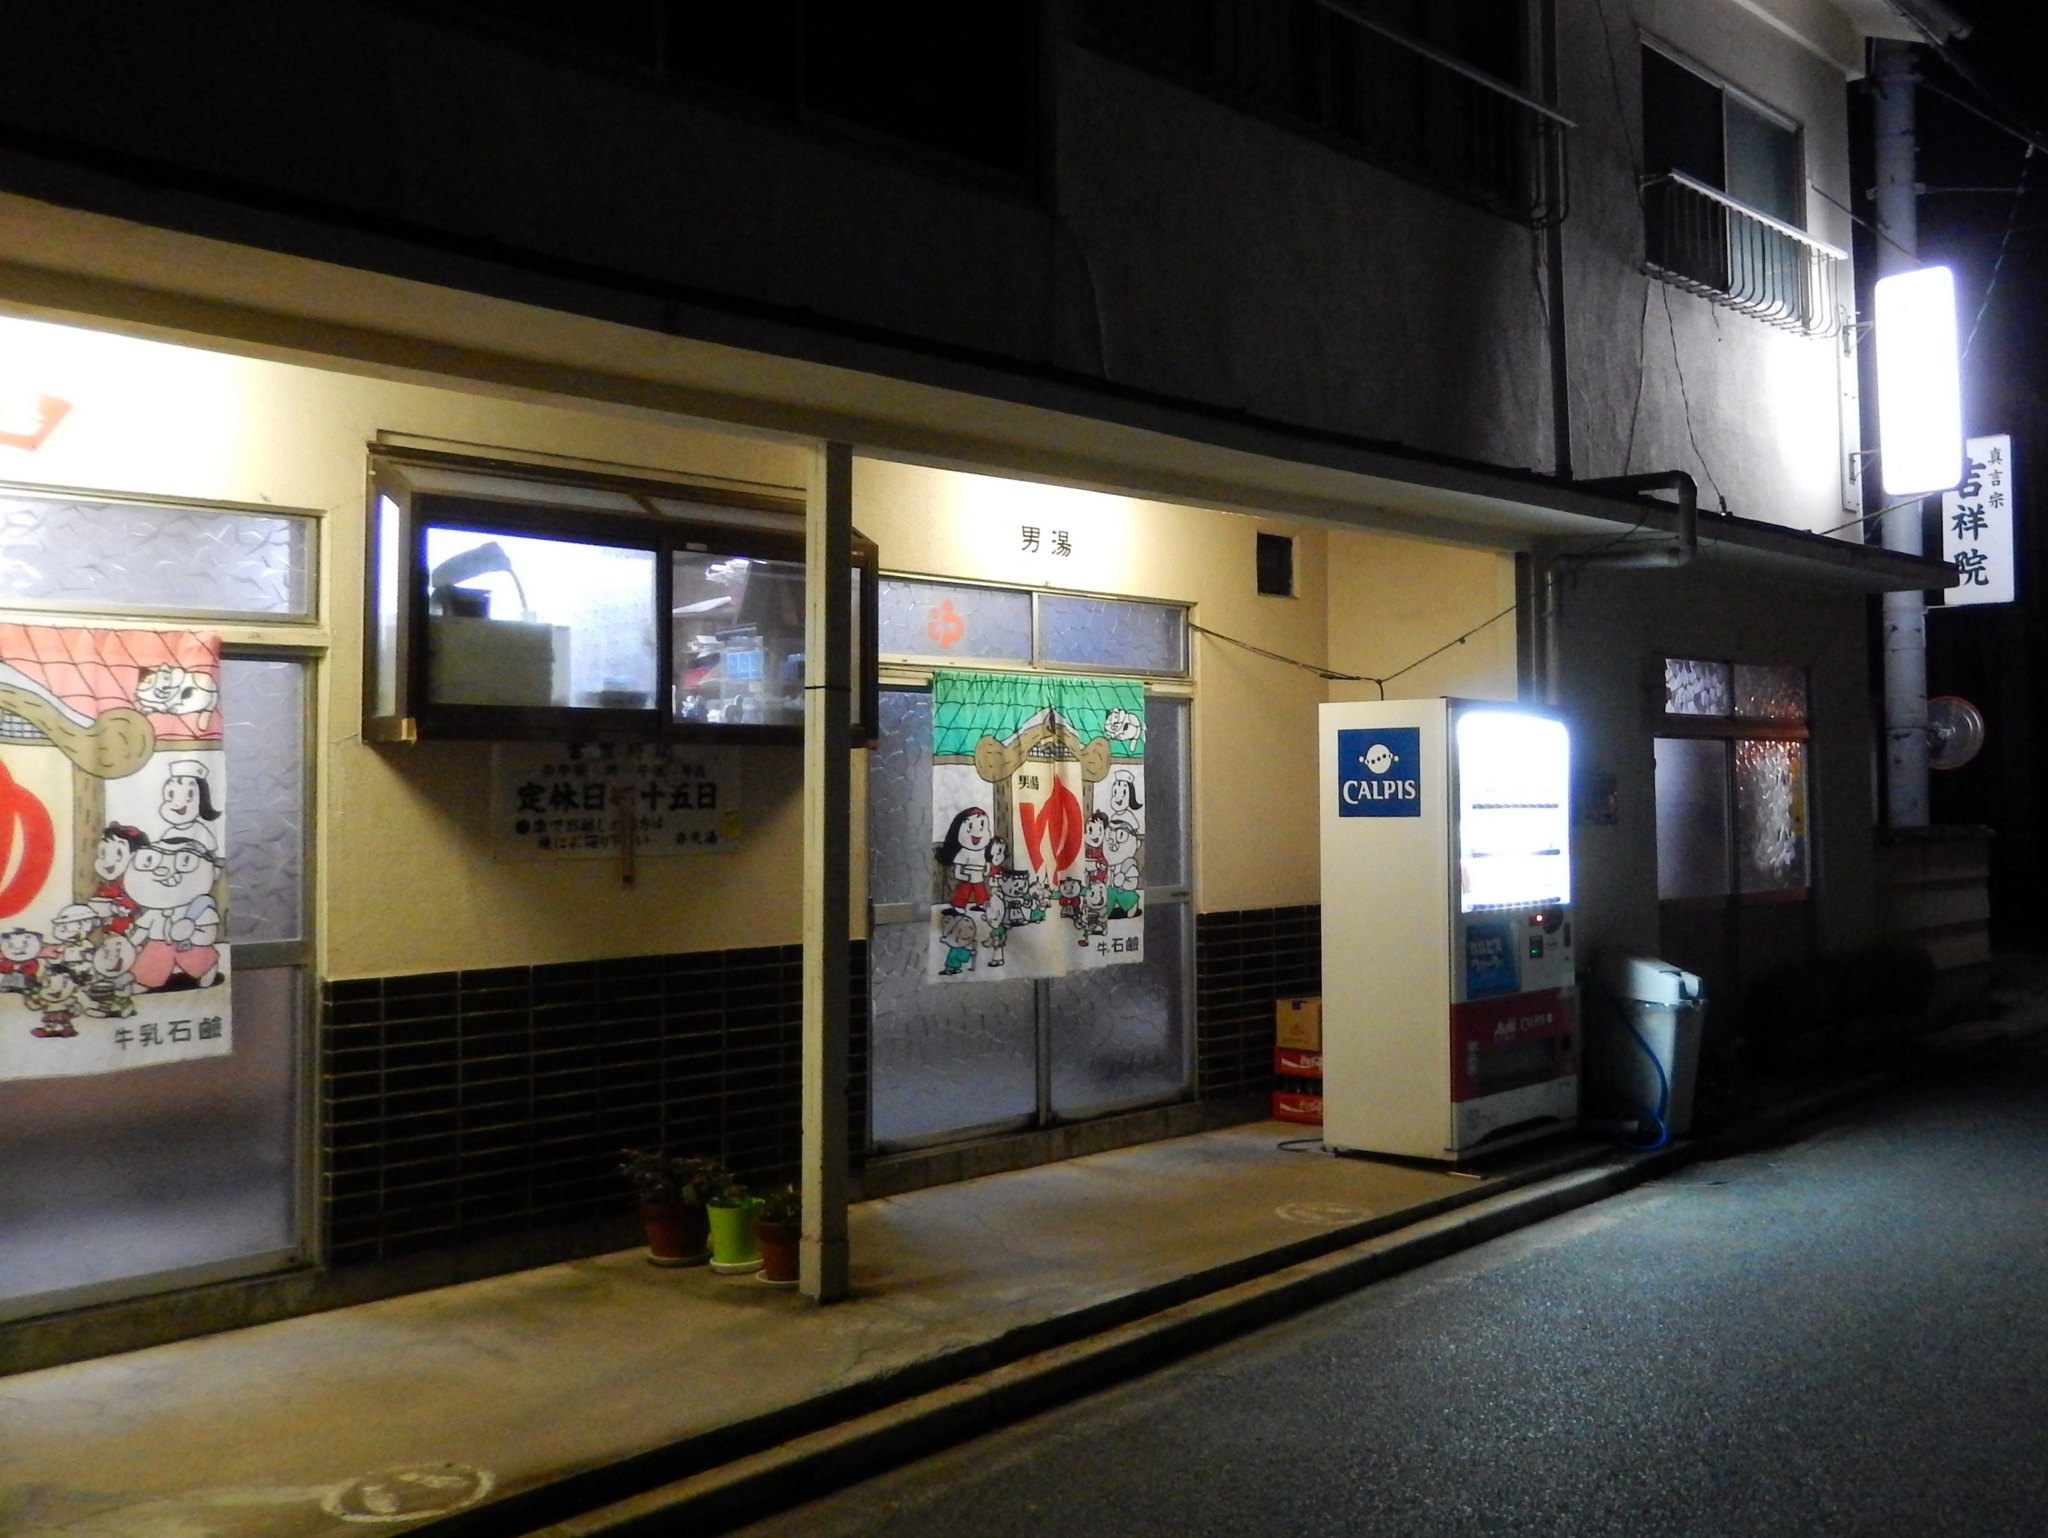 f:id:ToshUeno:20140926194028j:plain